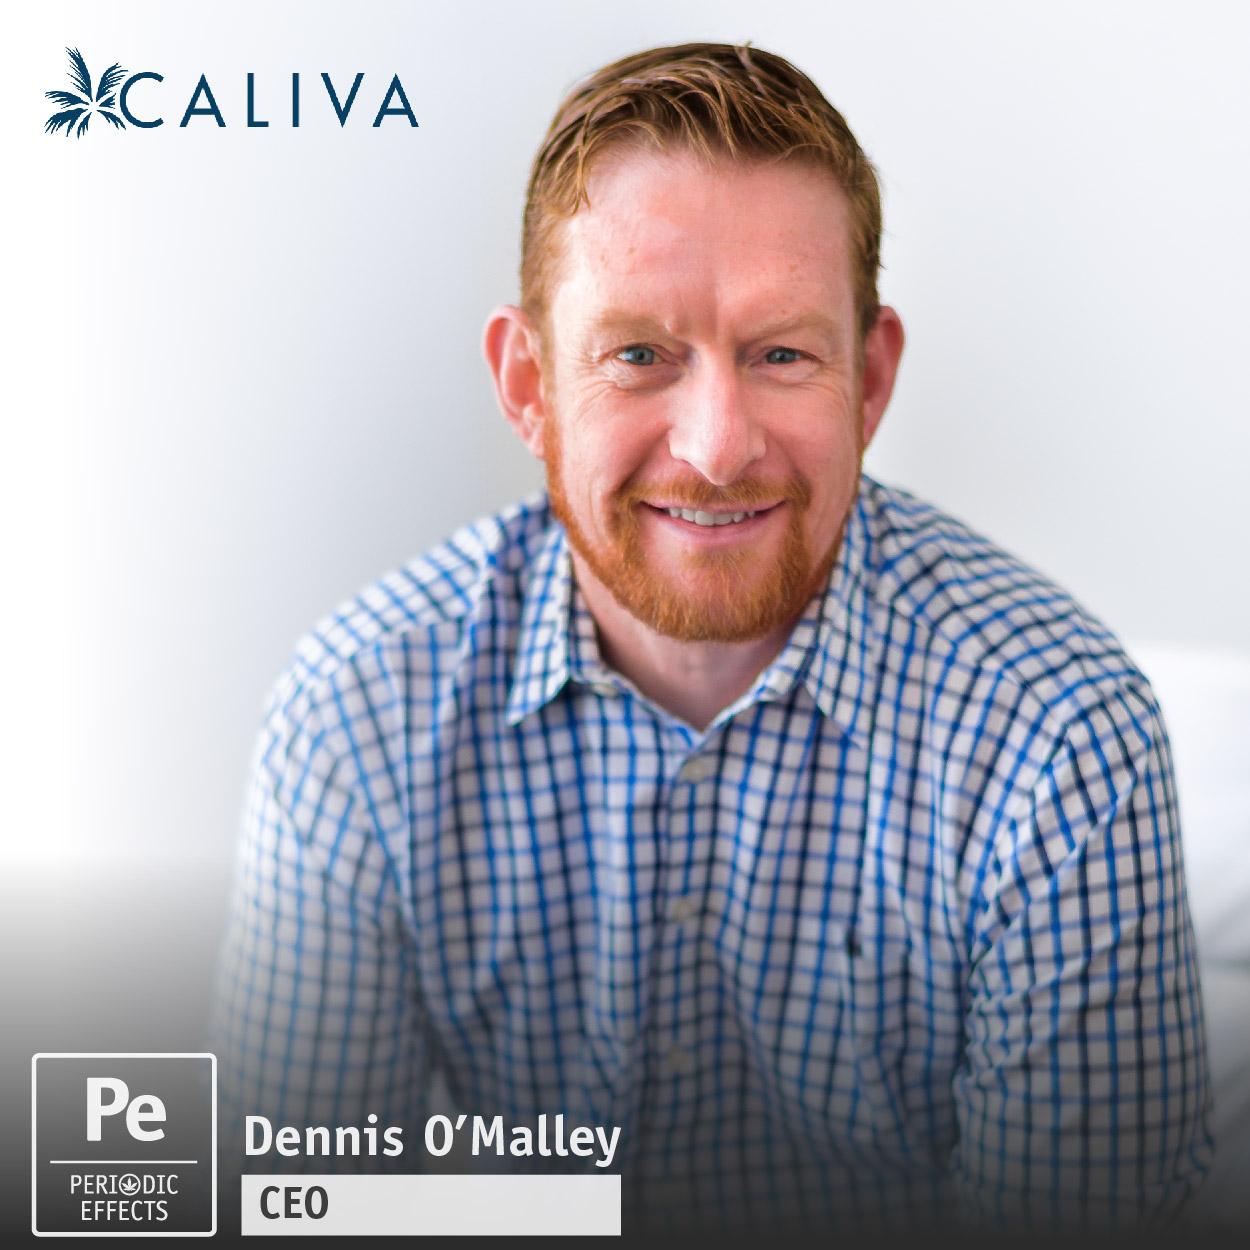 Dennis O'Malley, CEO of Caliva, a vertically integrated cannabis company in california